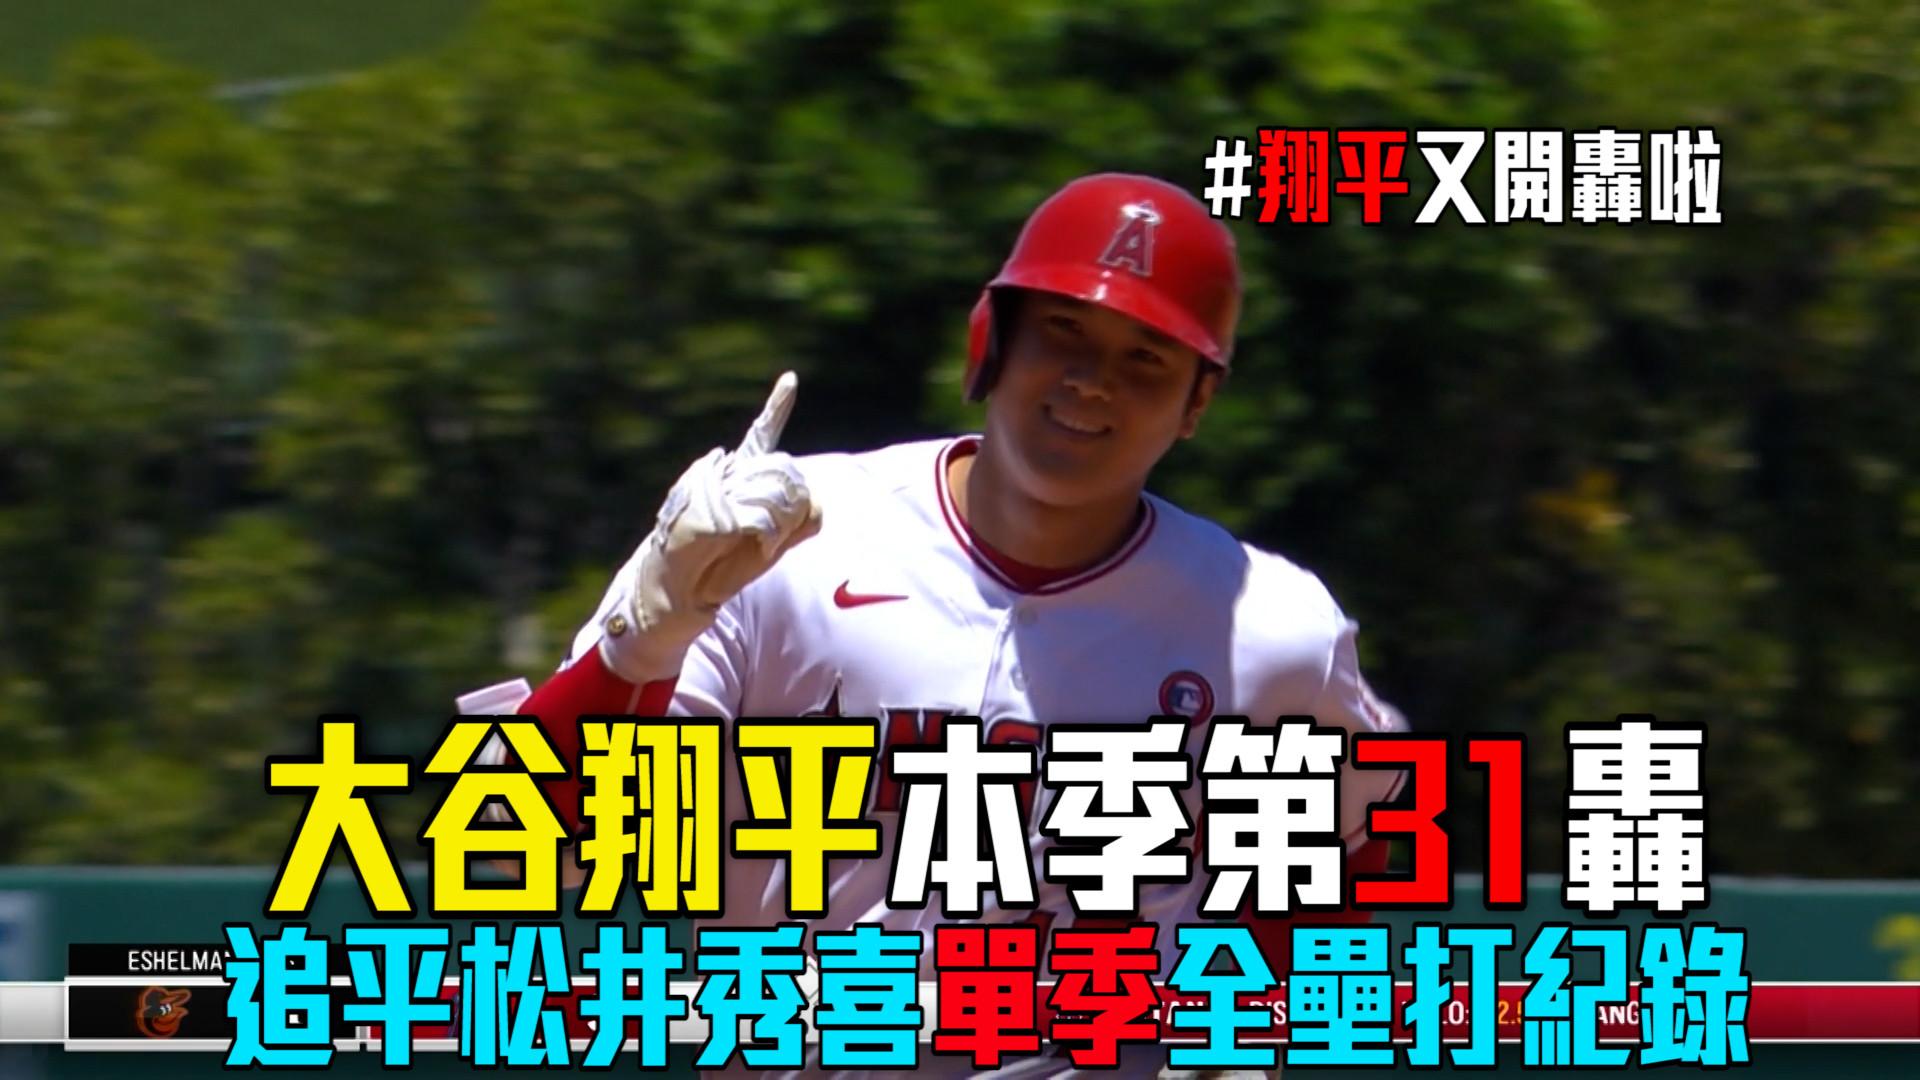 【MLB看愛爾達】大谷翔平本季第31轟 天使6:5險勝金鶯 07/05